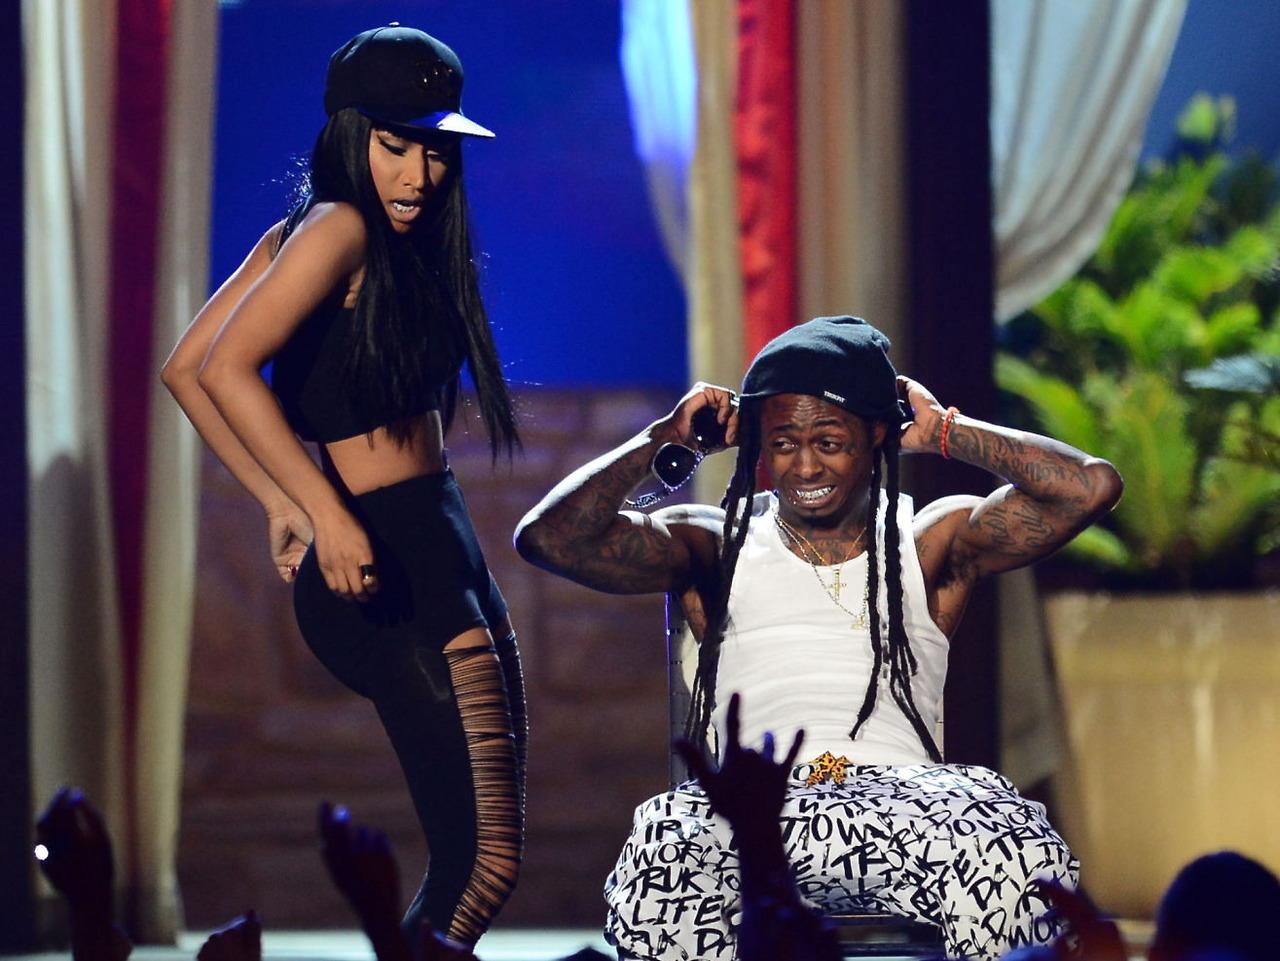 Nicki Minaj 2013 : Nicki Minaj at the 2013 Billboard Music Awards -46